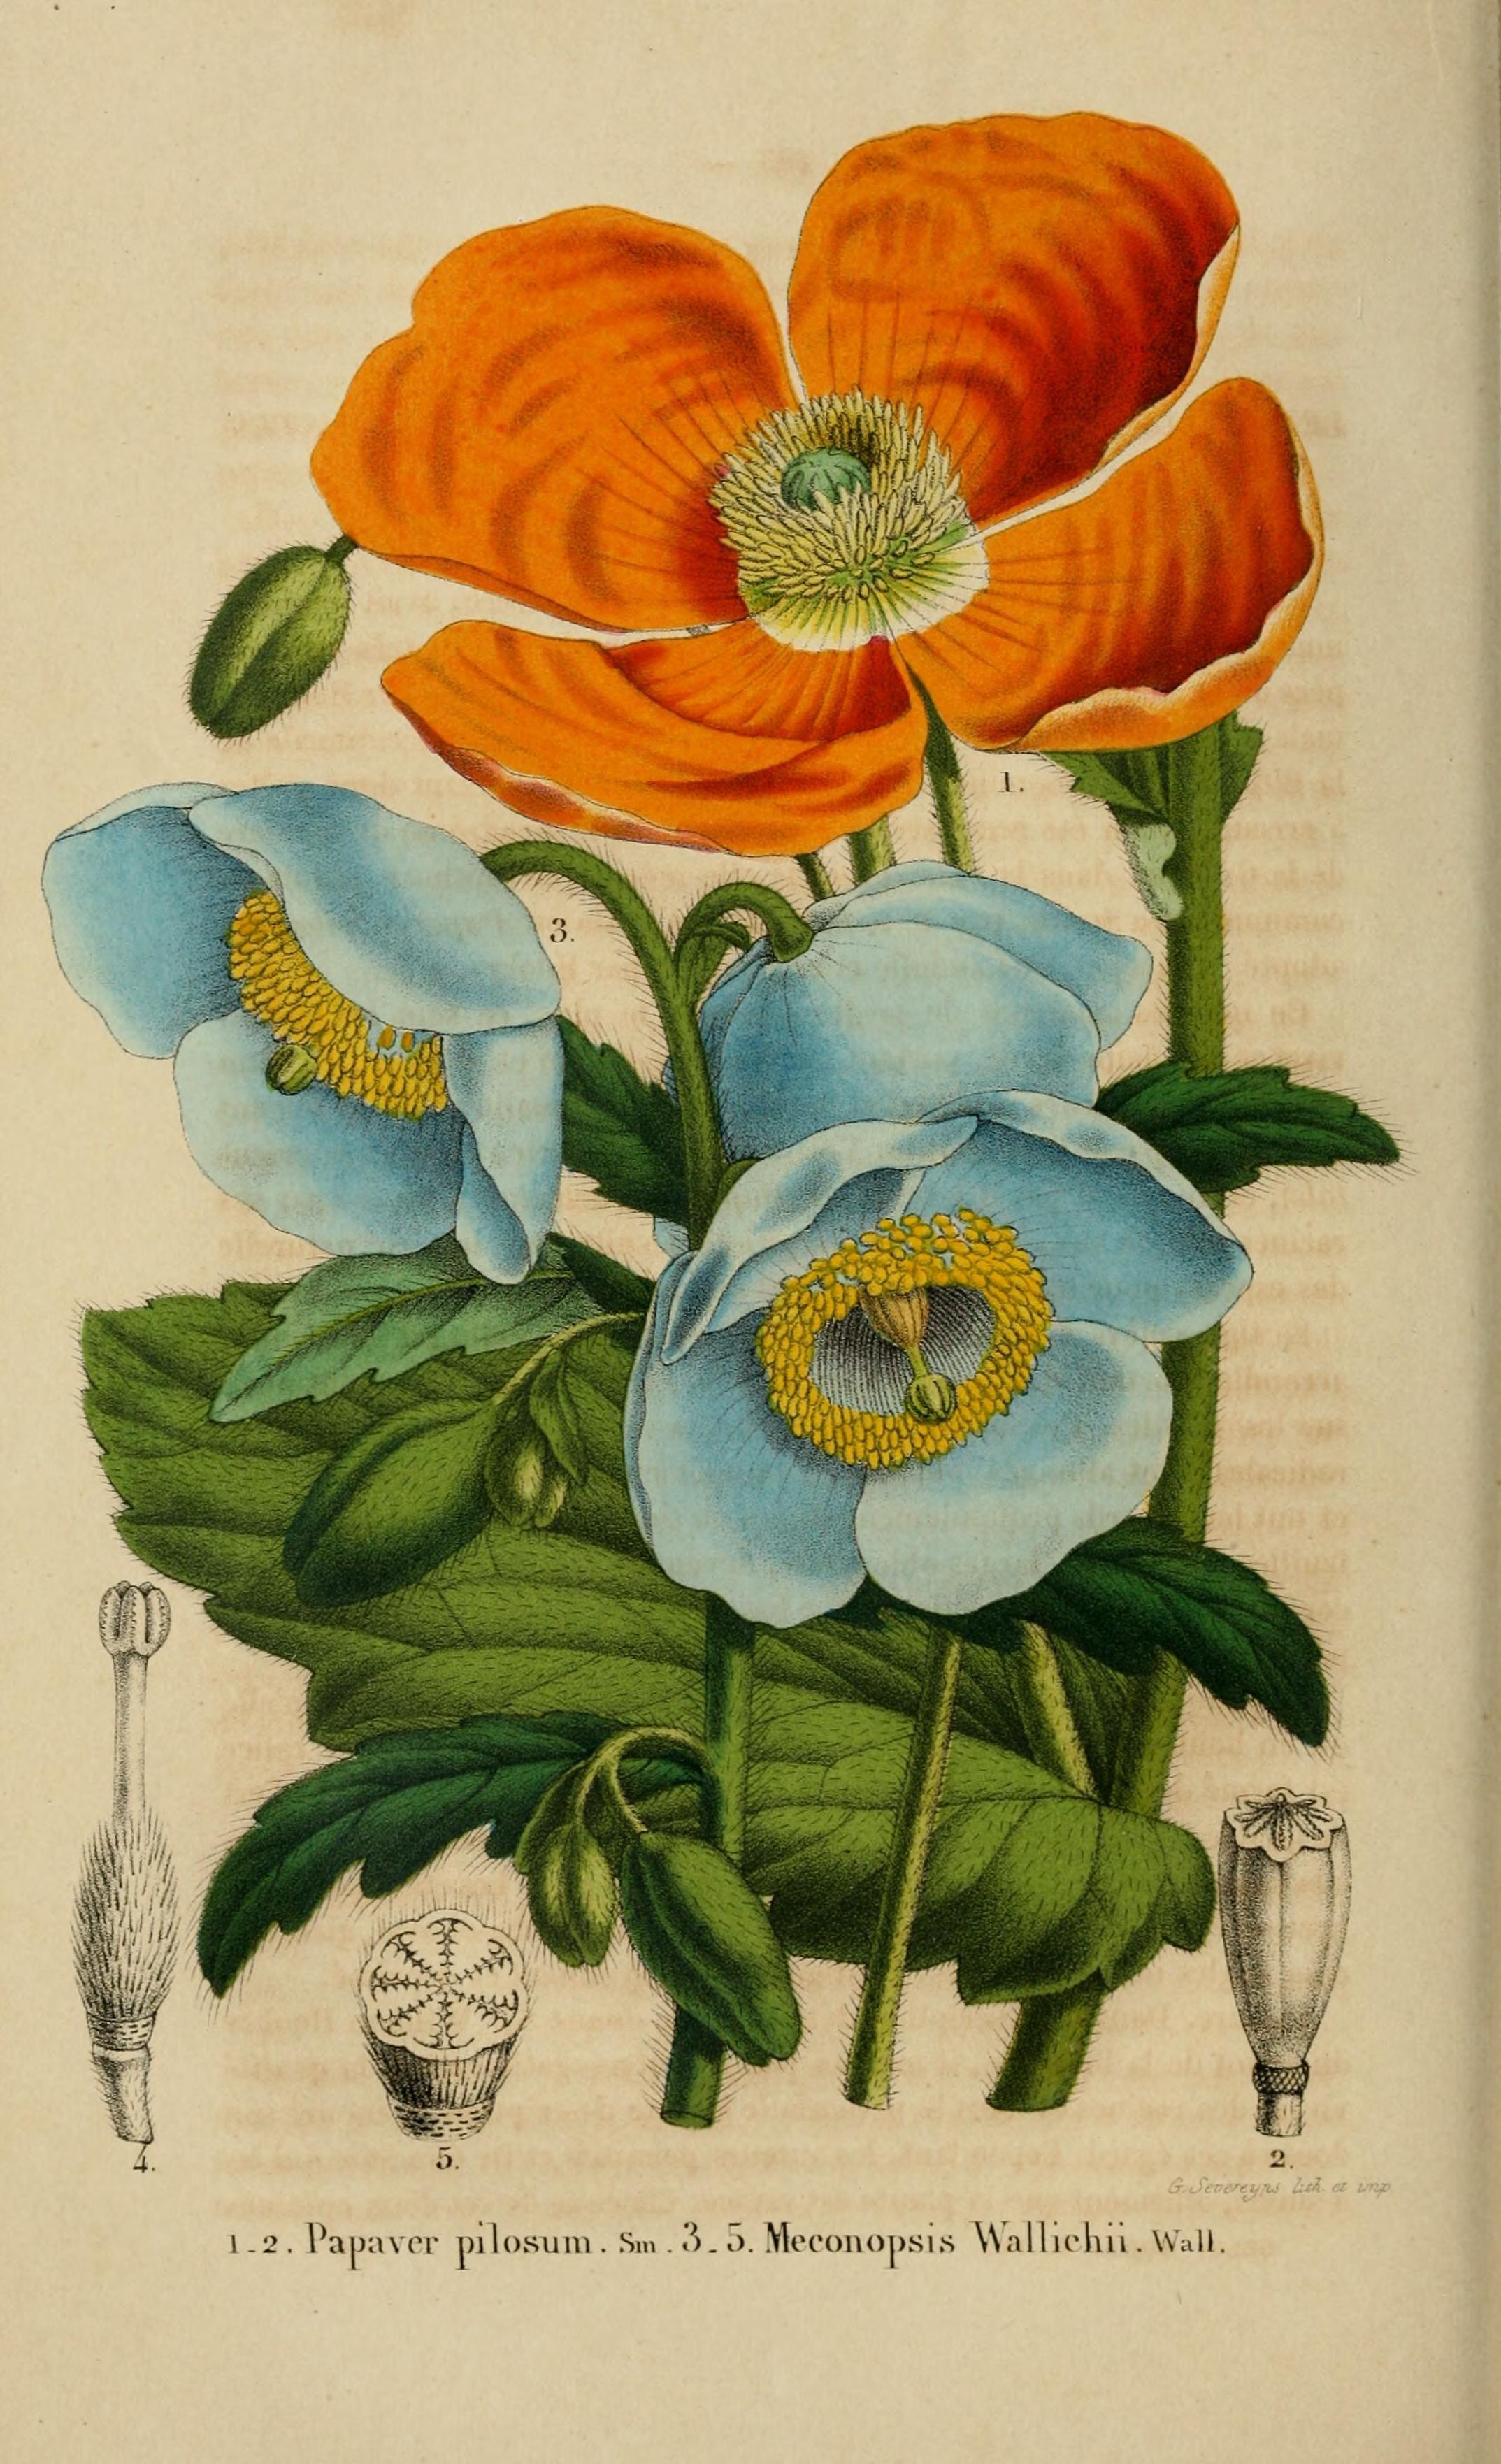 Meconopsis paniculata and Papaver pilosum - circa 1854